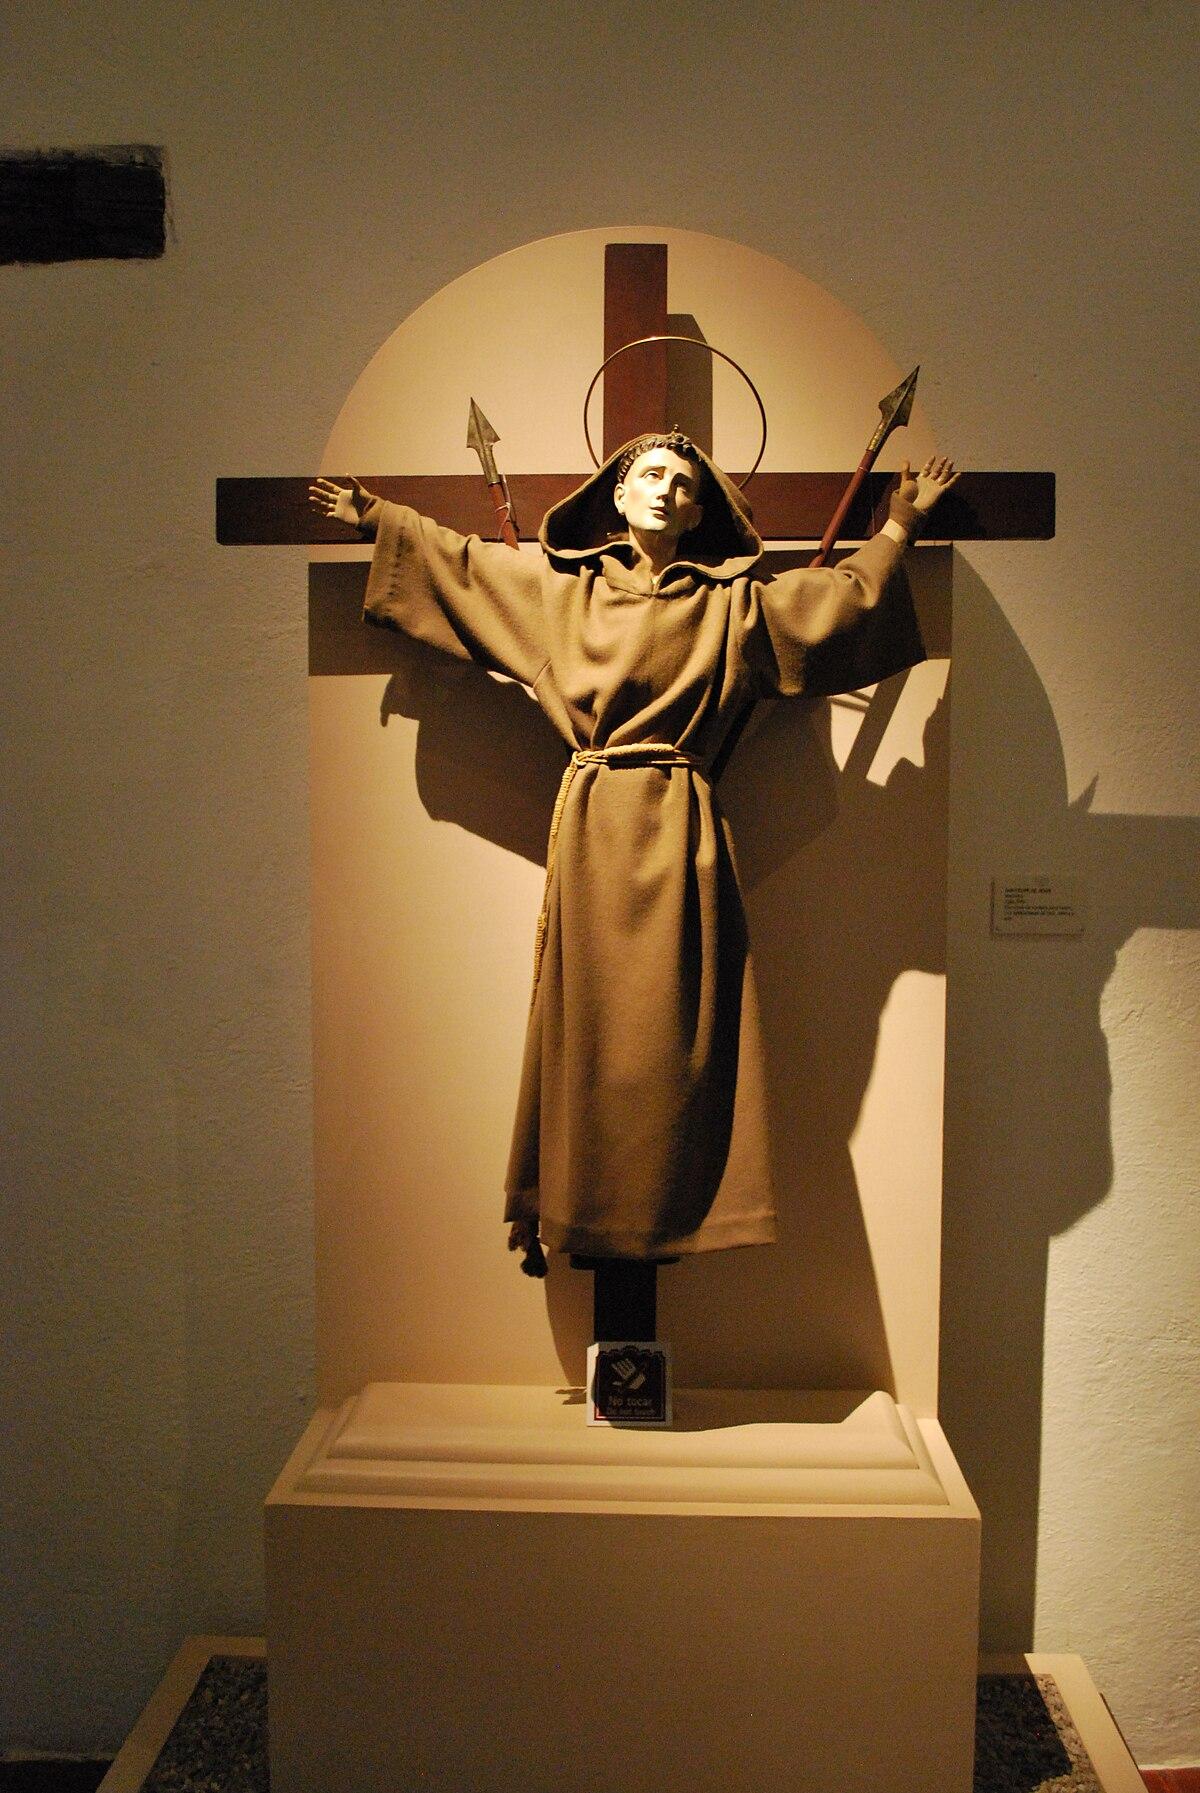 philip of jesus wikipedia